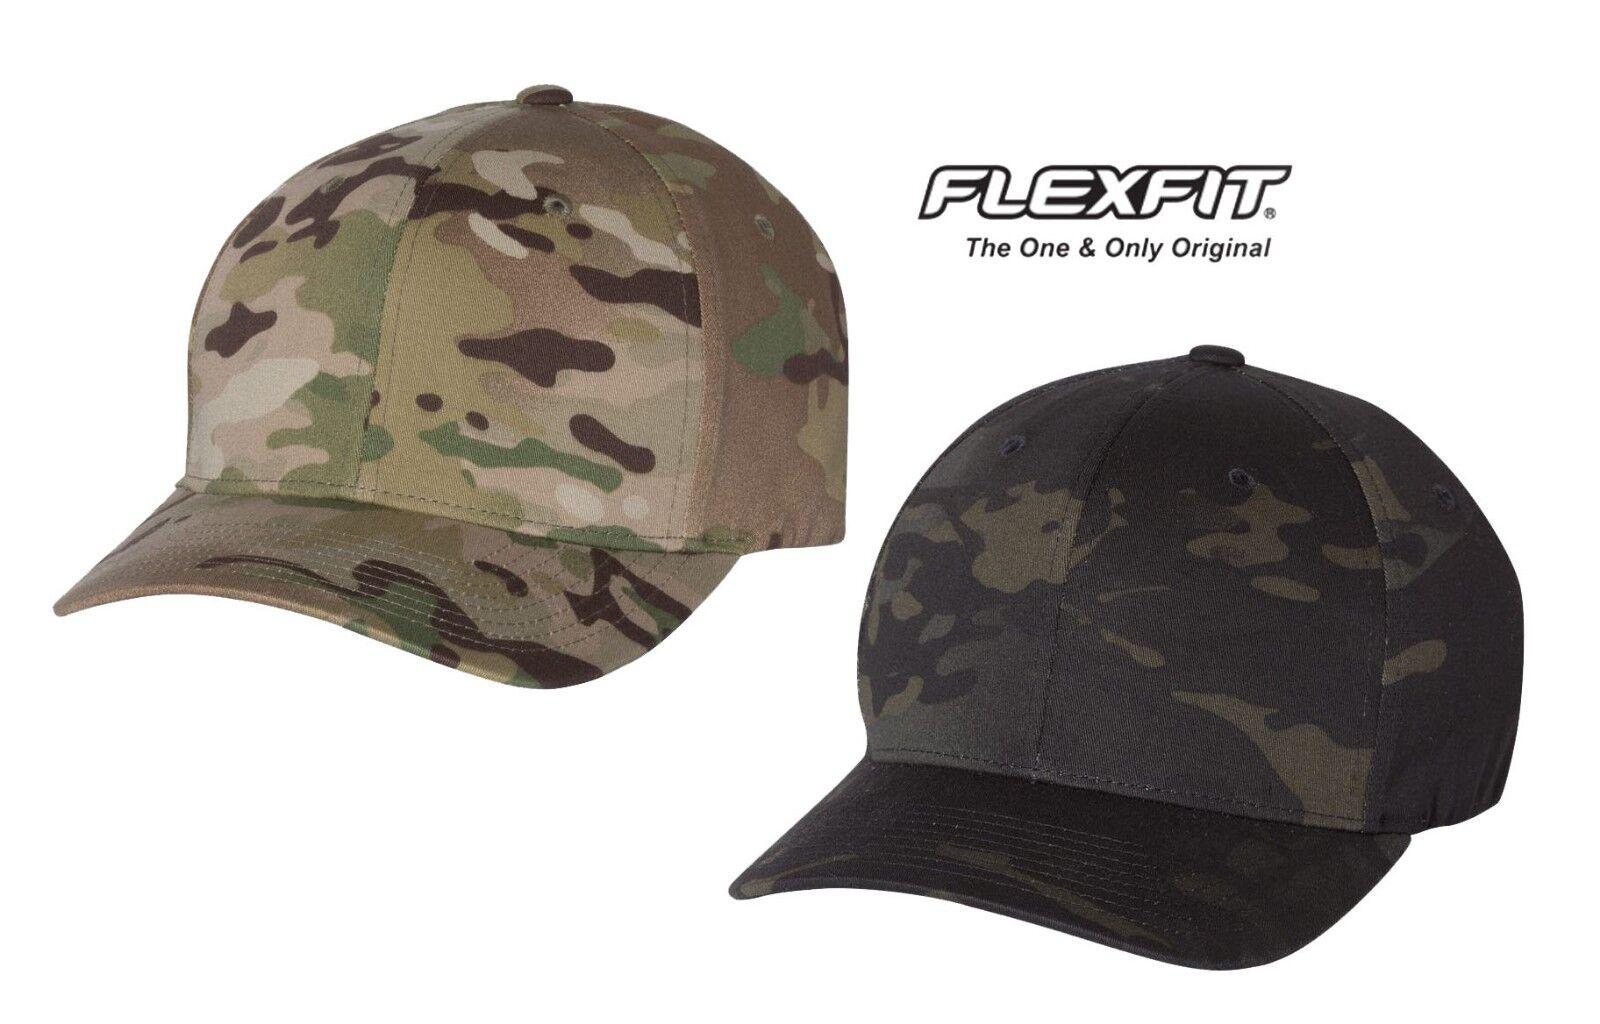 e489a26162a35 Flexfit-Multicam Camo Cap Hat baseball hunting